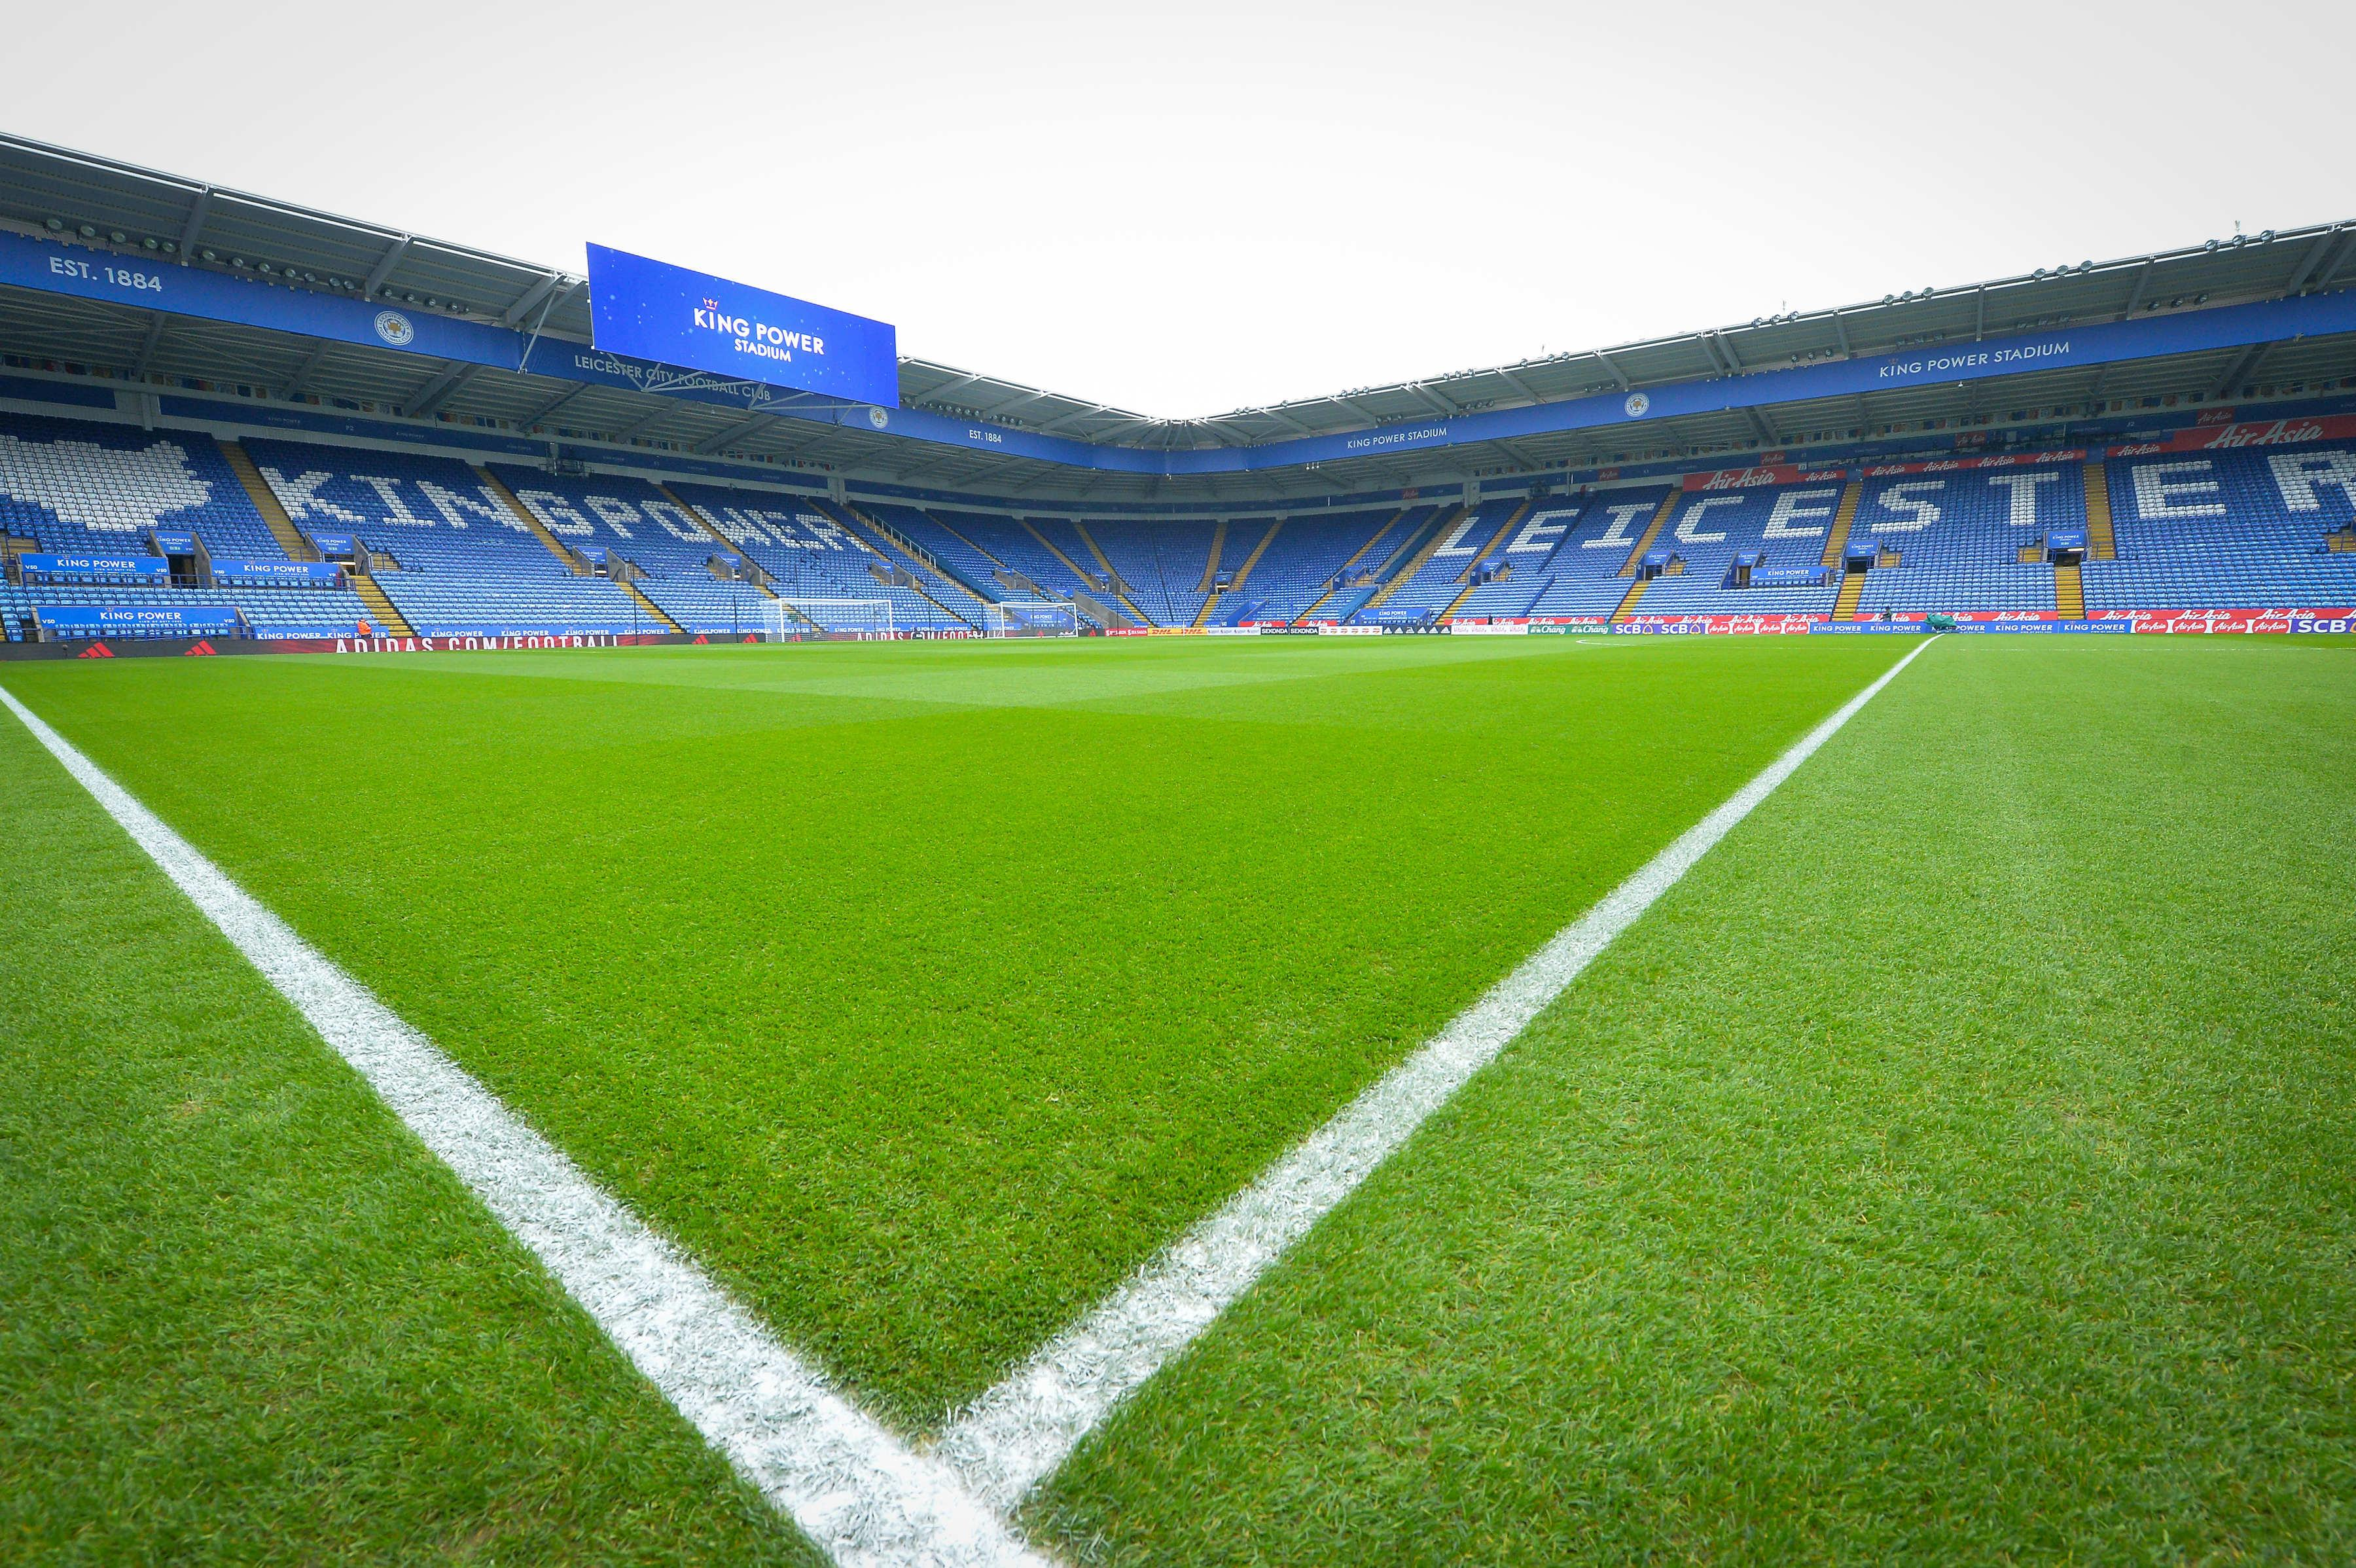 italian side atalanta to visit king power stadium in pre season visit king power stadium in pre season